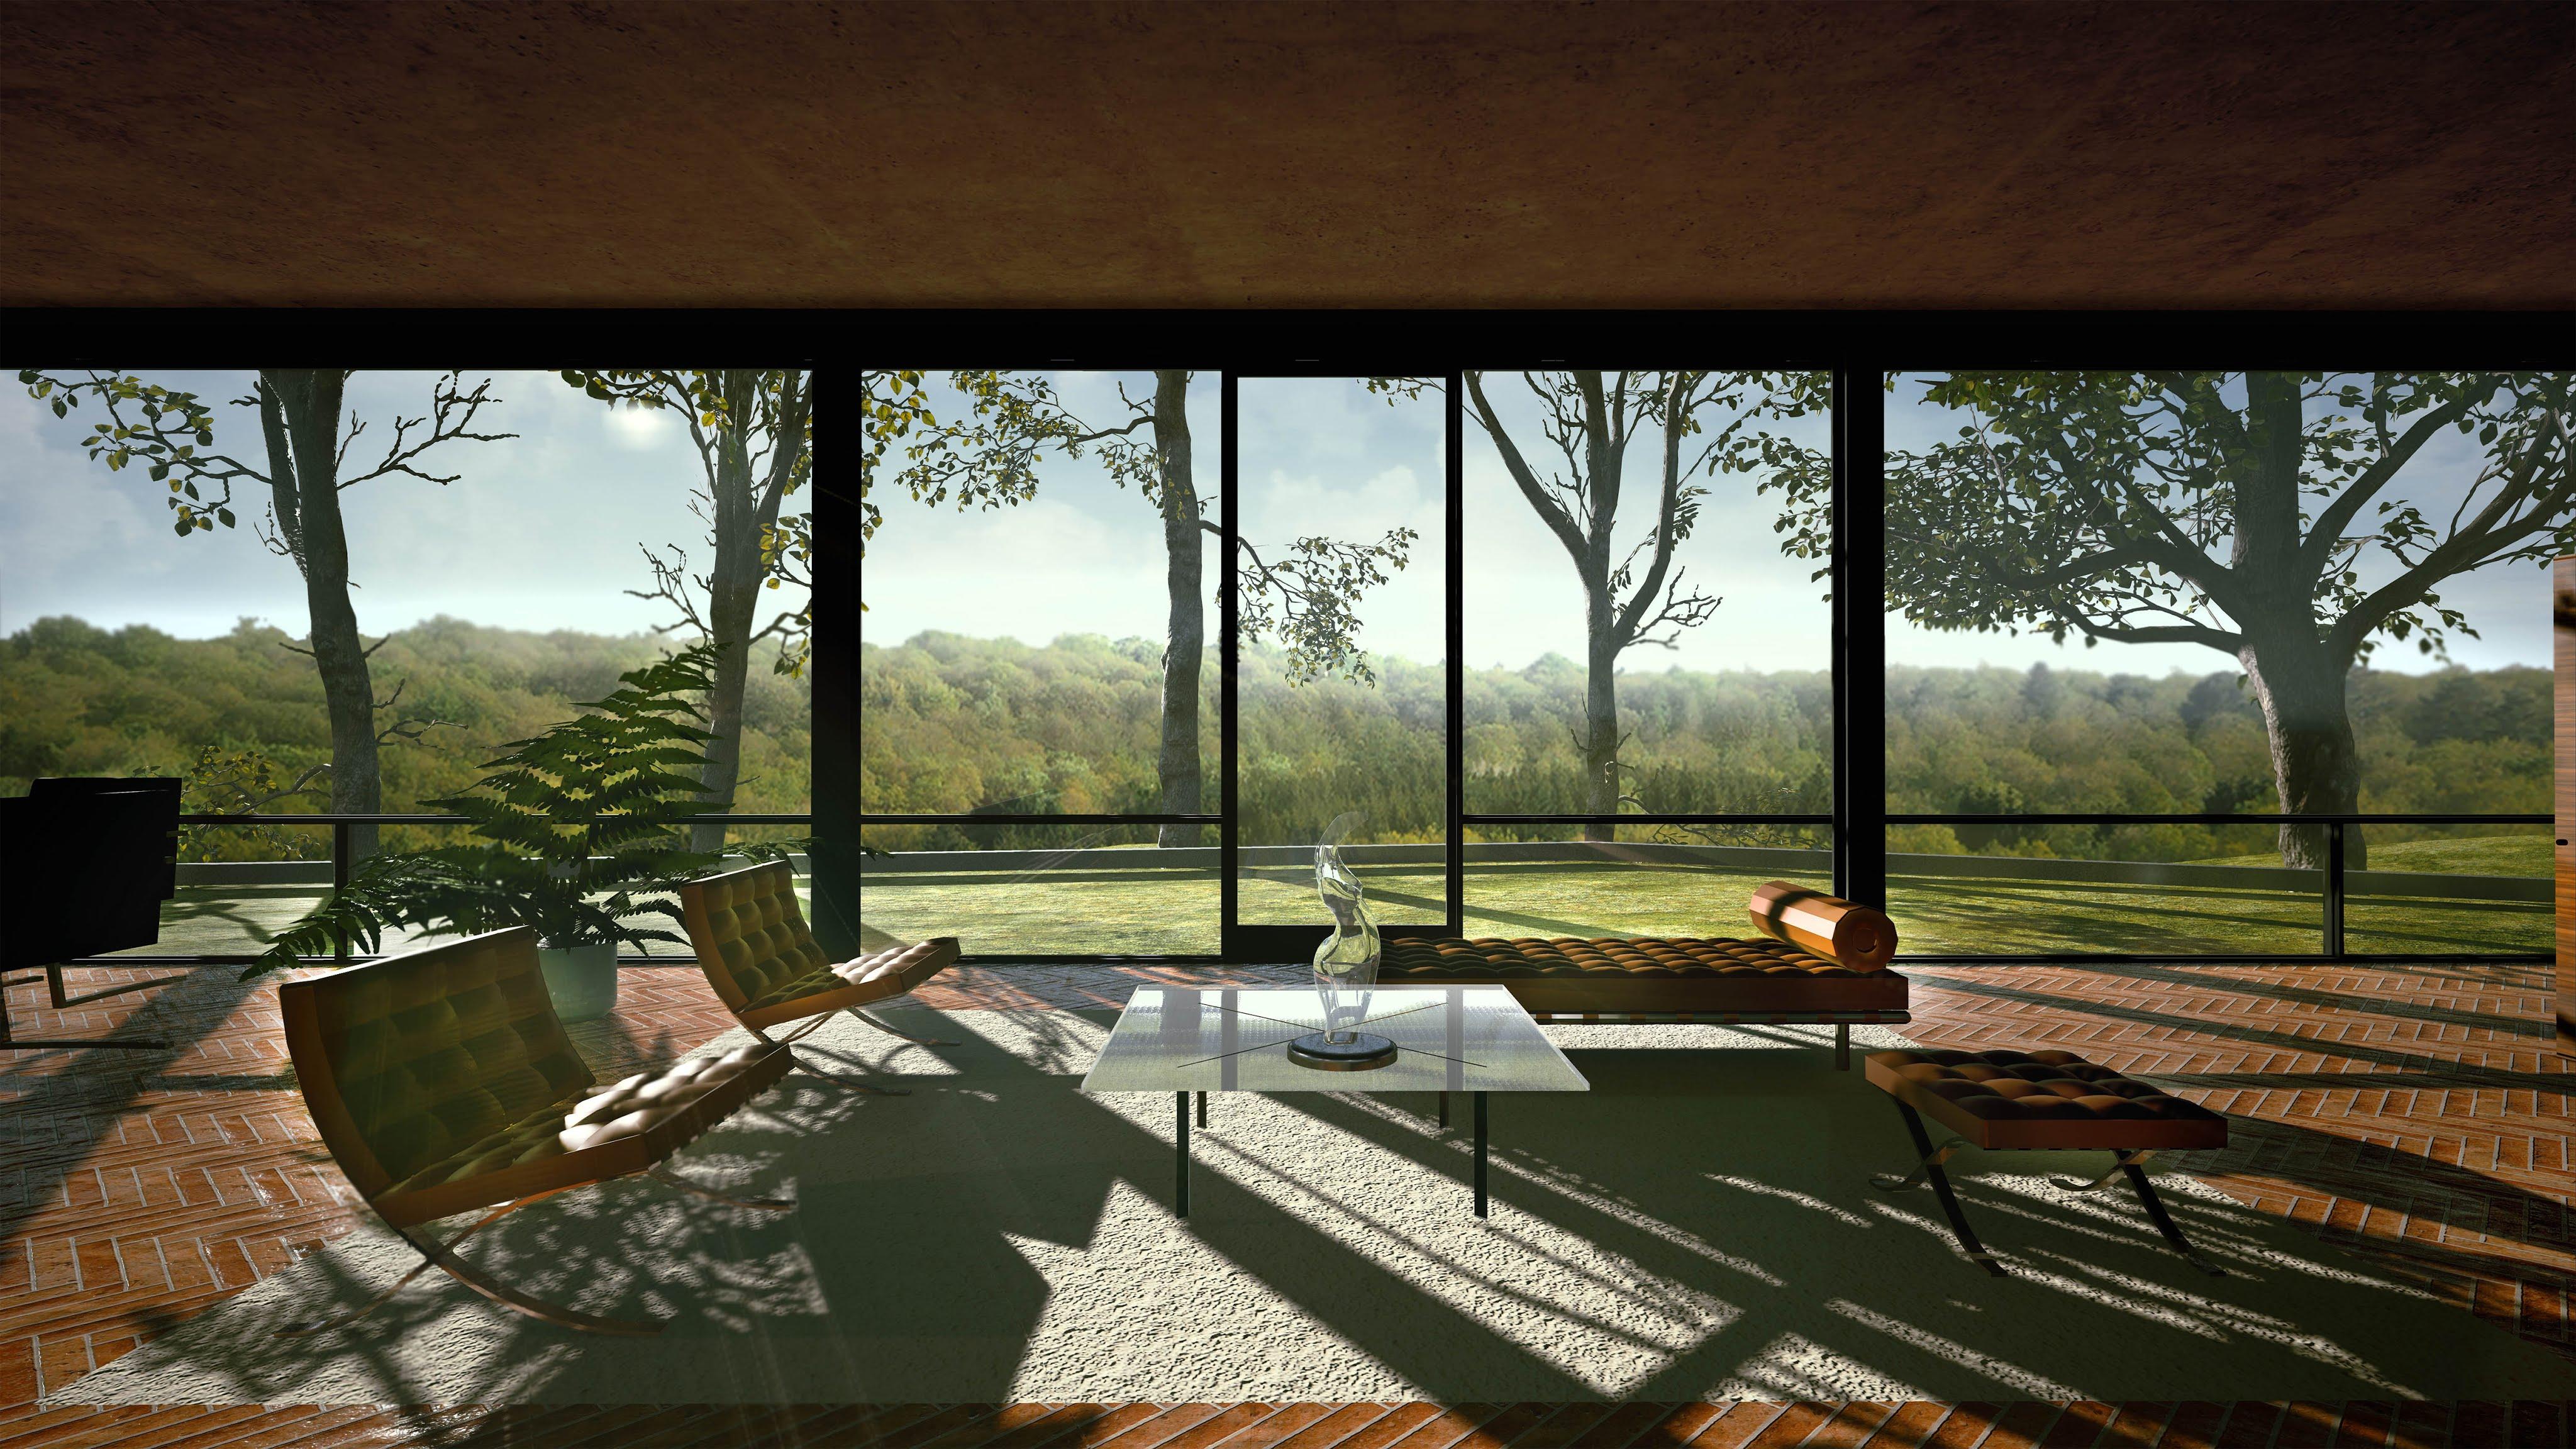 Philip Johnson Glass House the glass house – new canaan, connecticut | aeworldmap